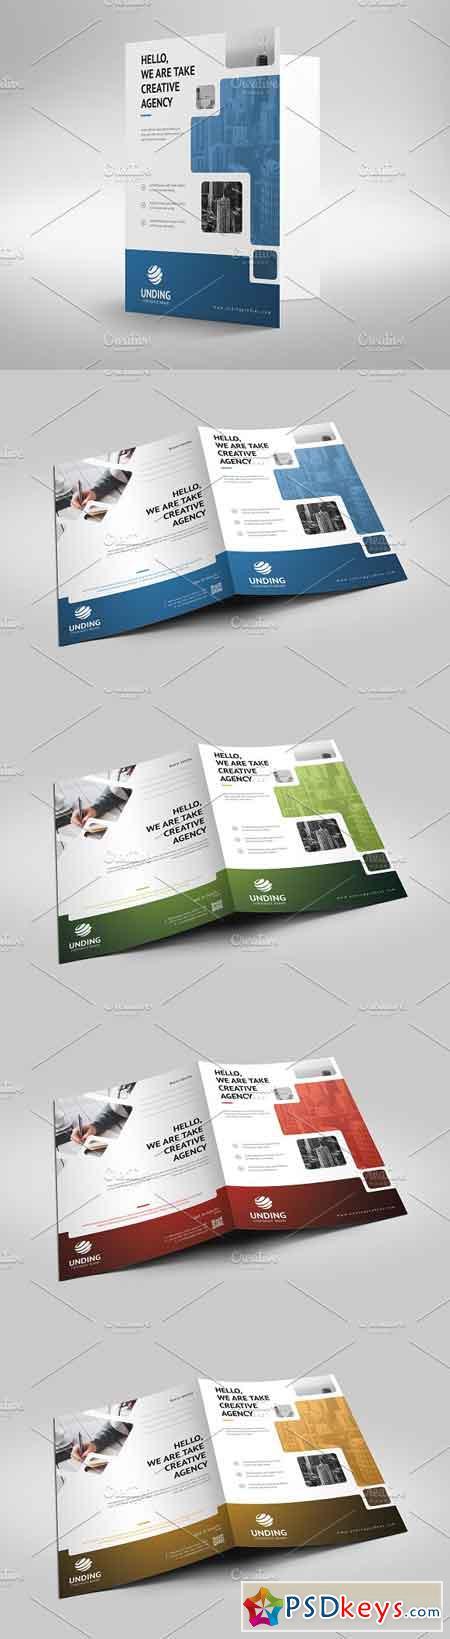 Presentation Folder 3277431